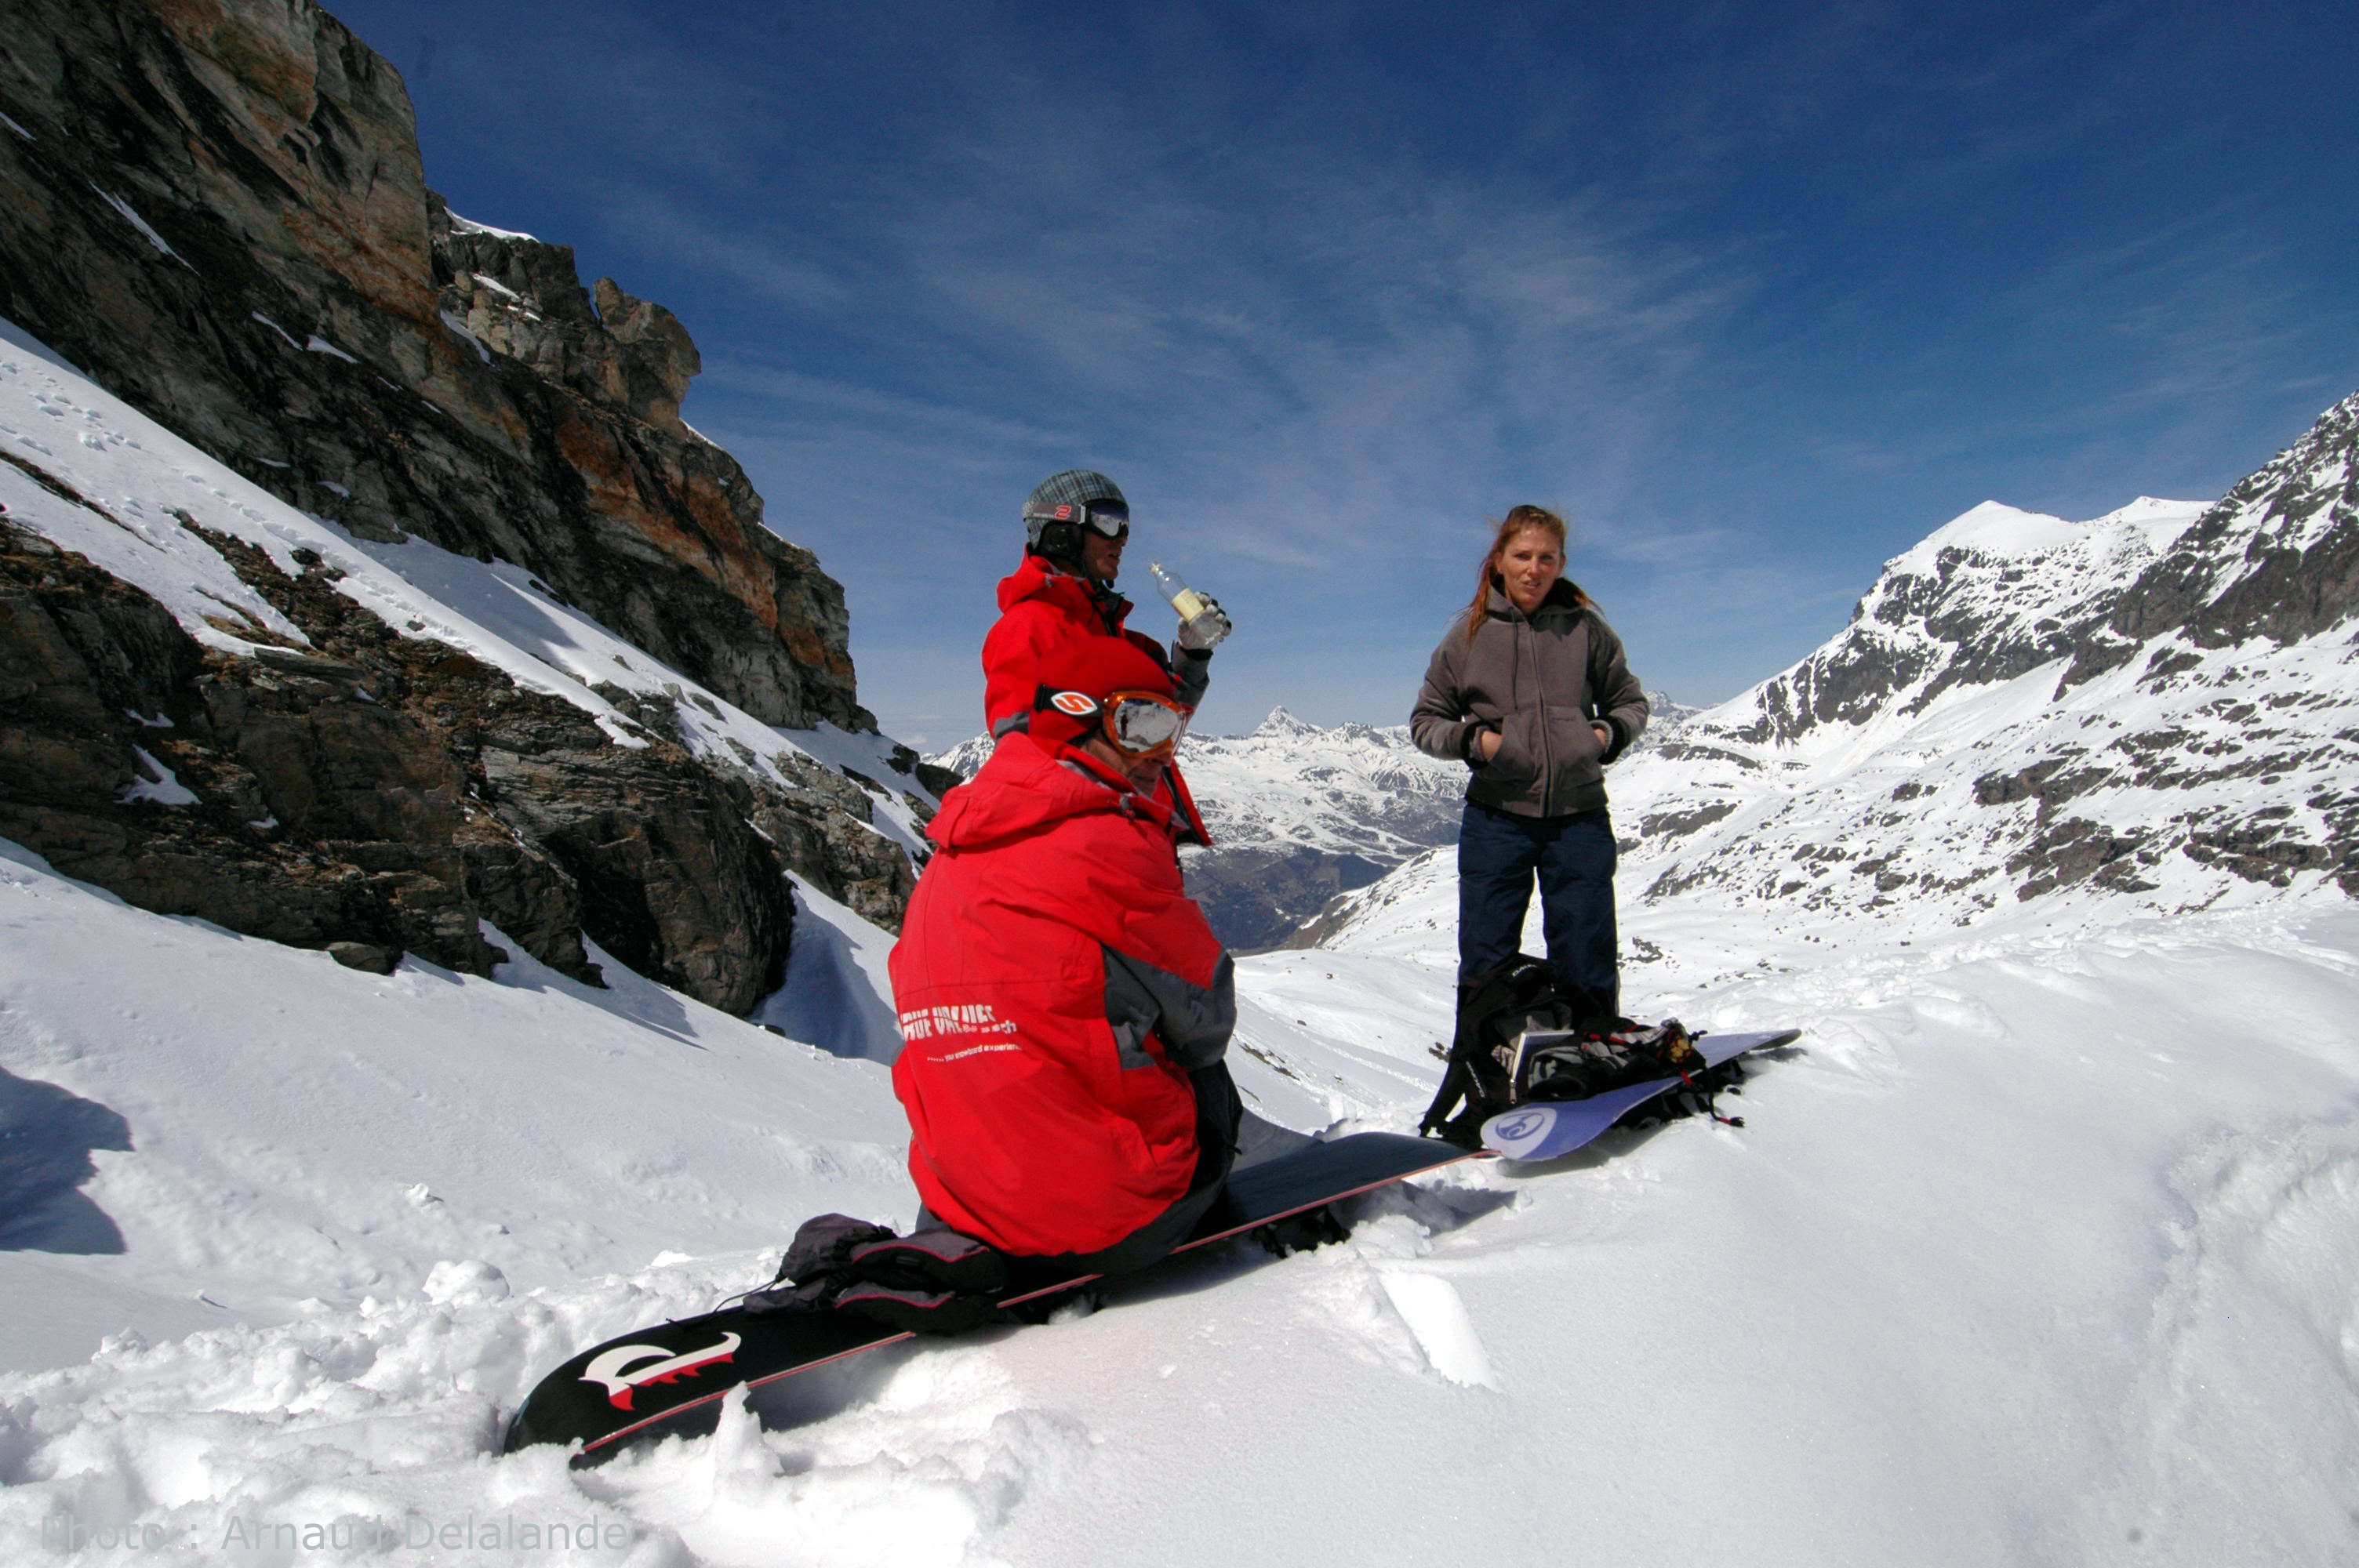 True Values Snowboard School Slide 2